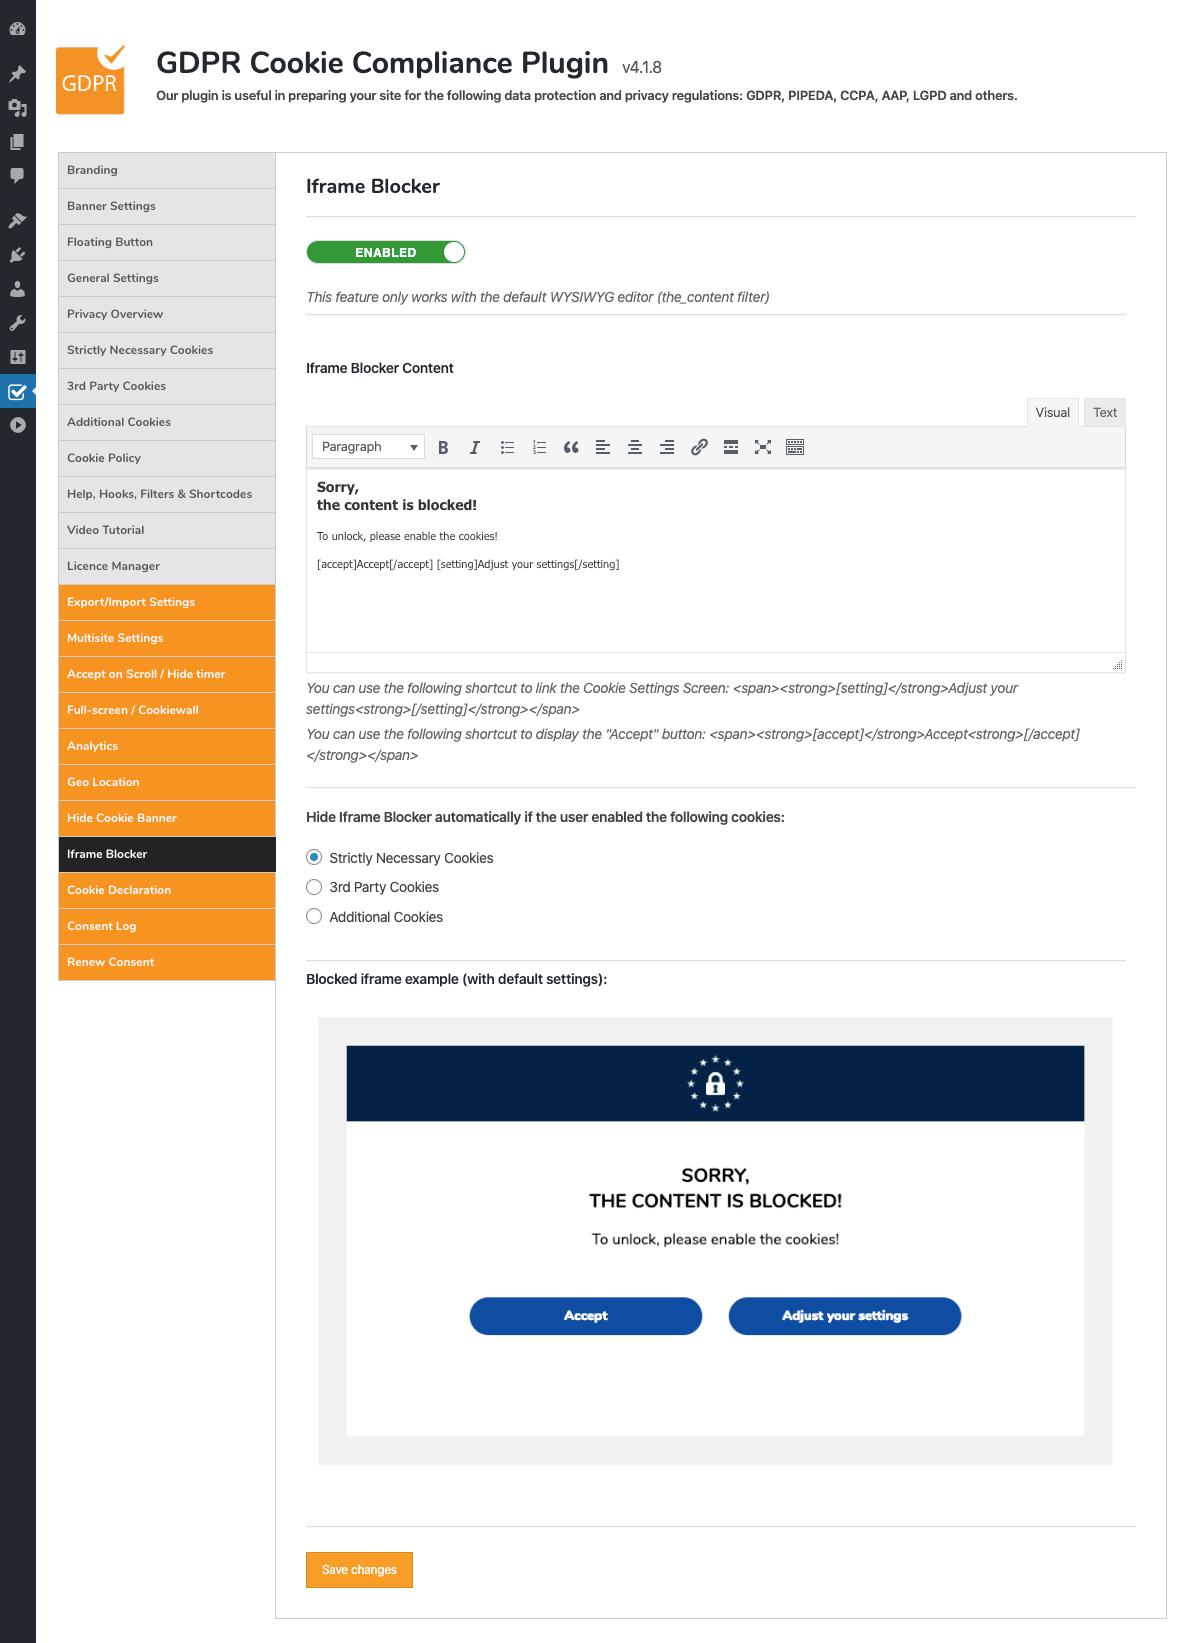 GDPR Cookie Compliance - Admin - Iframe Blocker / Pages [Premium]